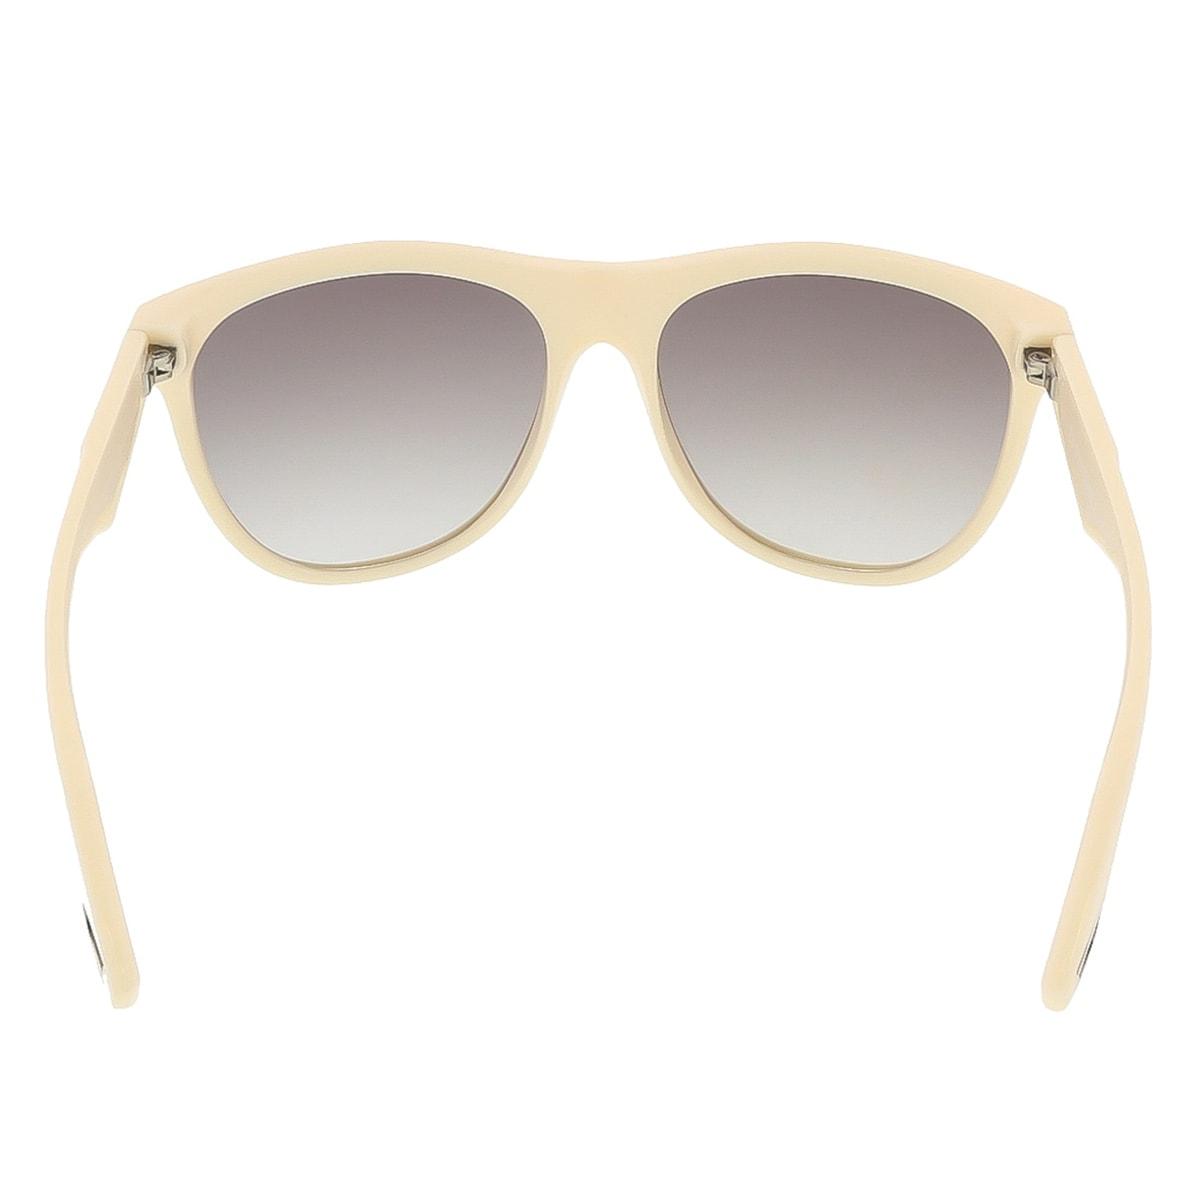 Diesel DL0002 Wayfarer Sonnenbrille, Ivory Frame/Gradient Grey